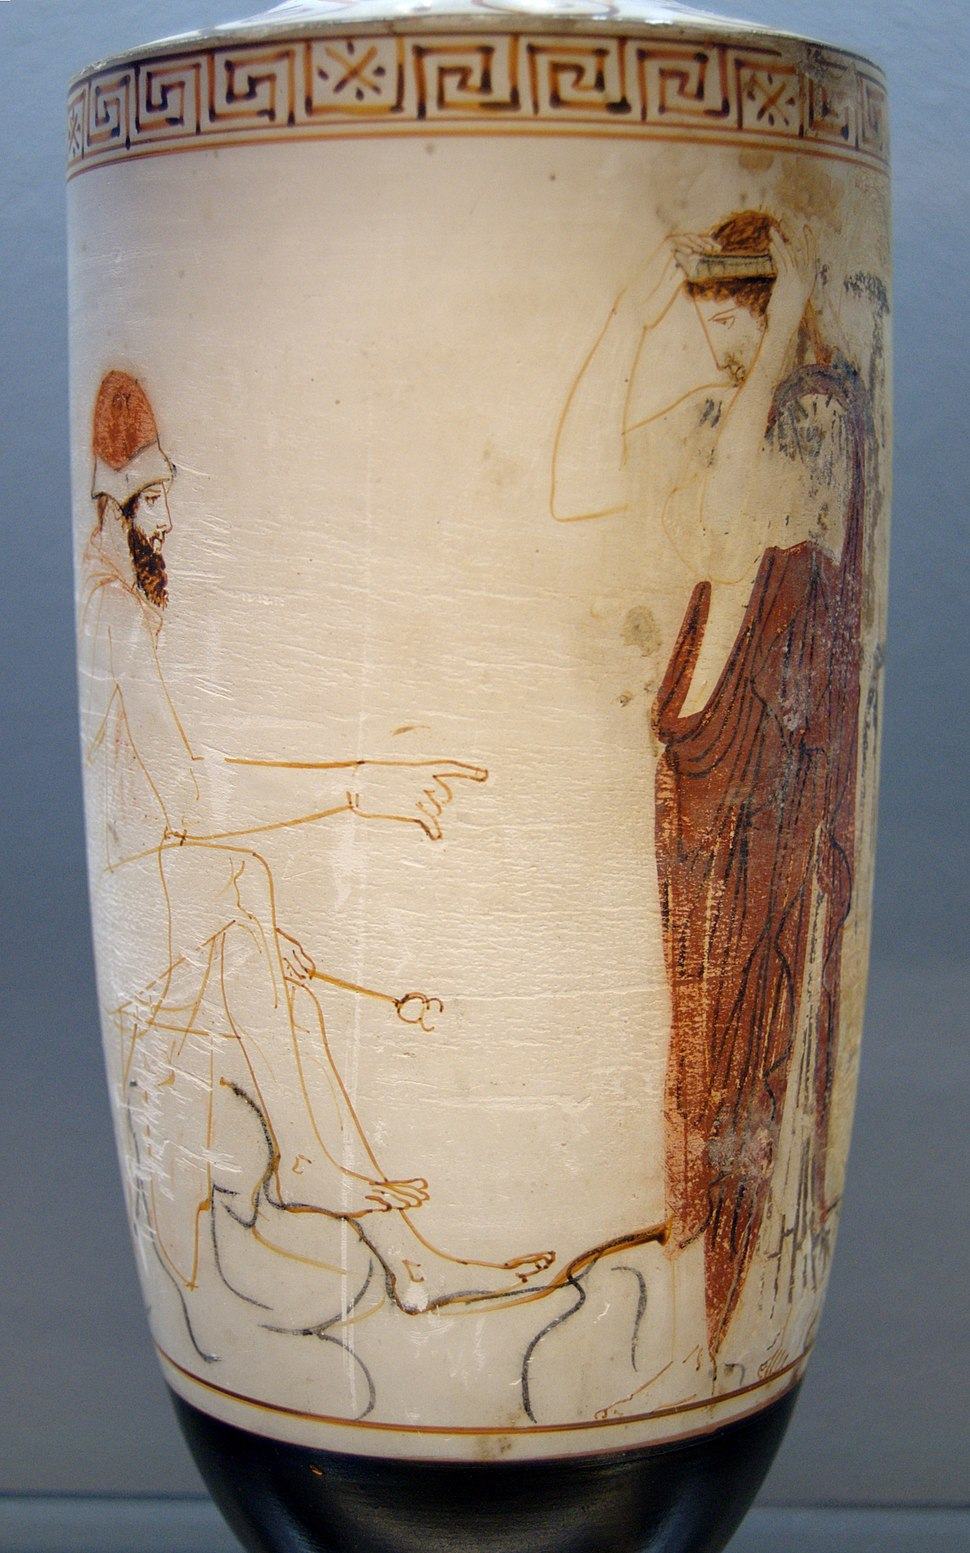 Hermes Psykhopompos Staatliche Antikensammlungen 2797 n2